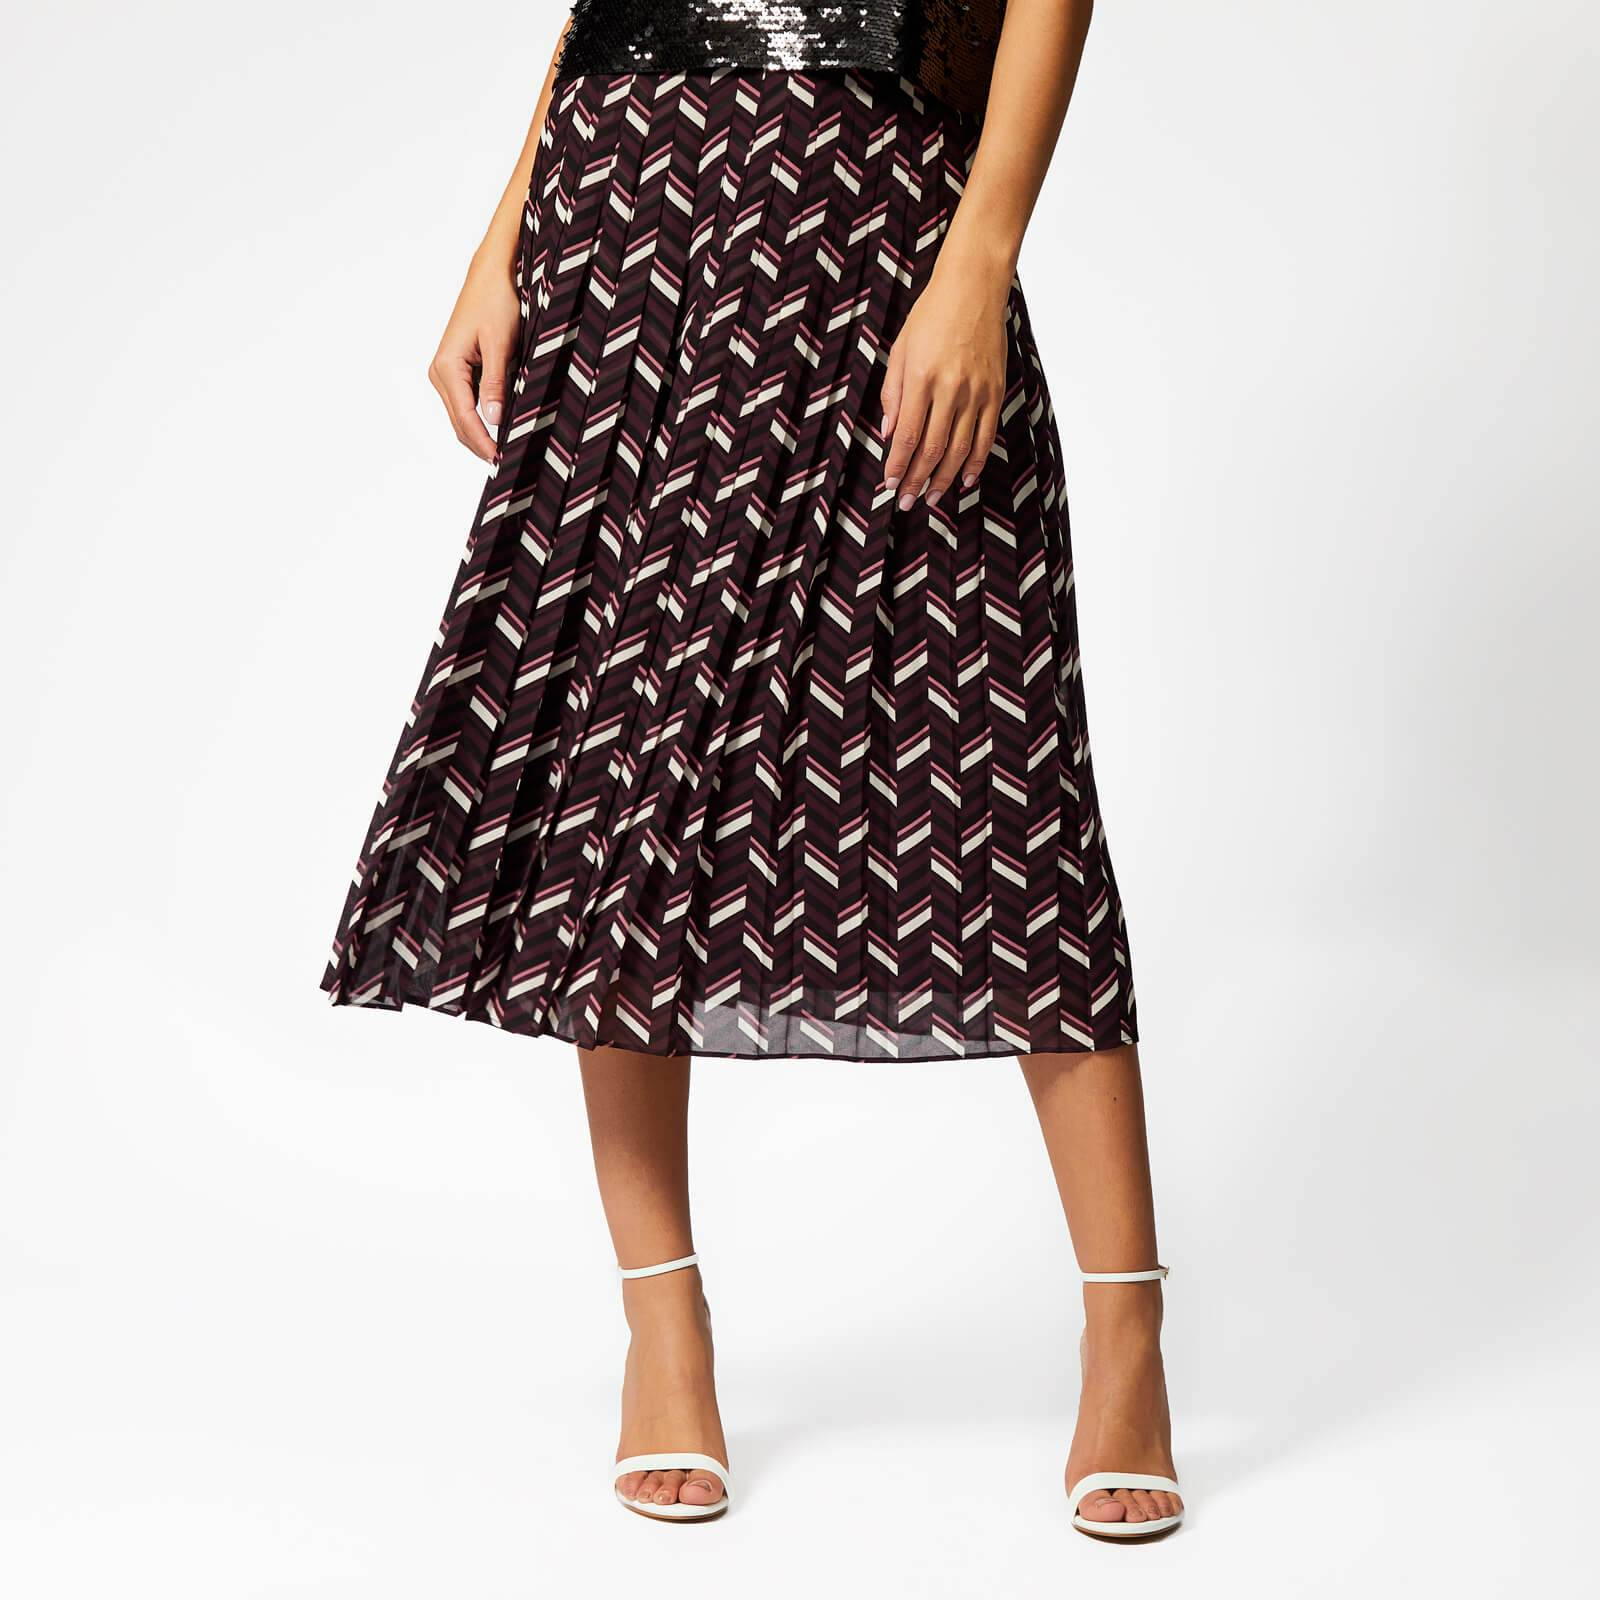 MICHAEL MICHAEL KORS Women's Chevron Pleat Skirt - Cordovan - US 2/UK 6 - Multi